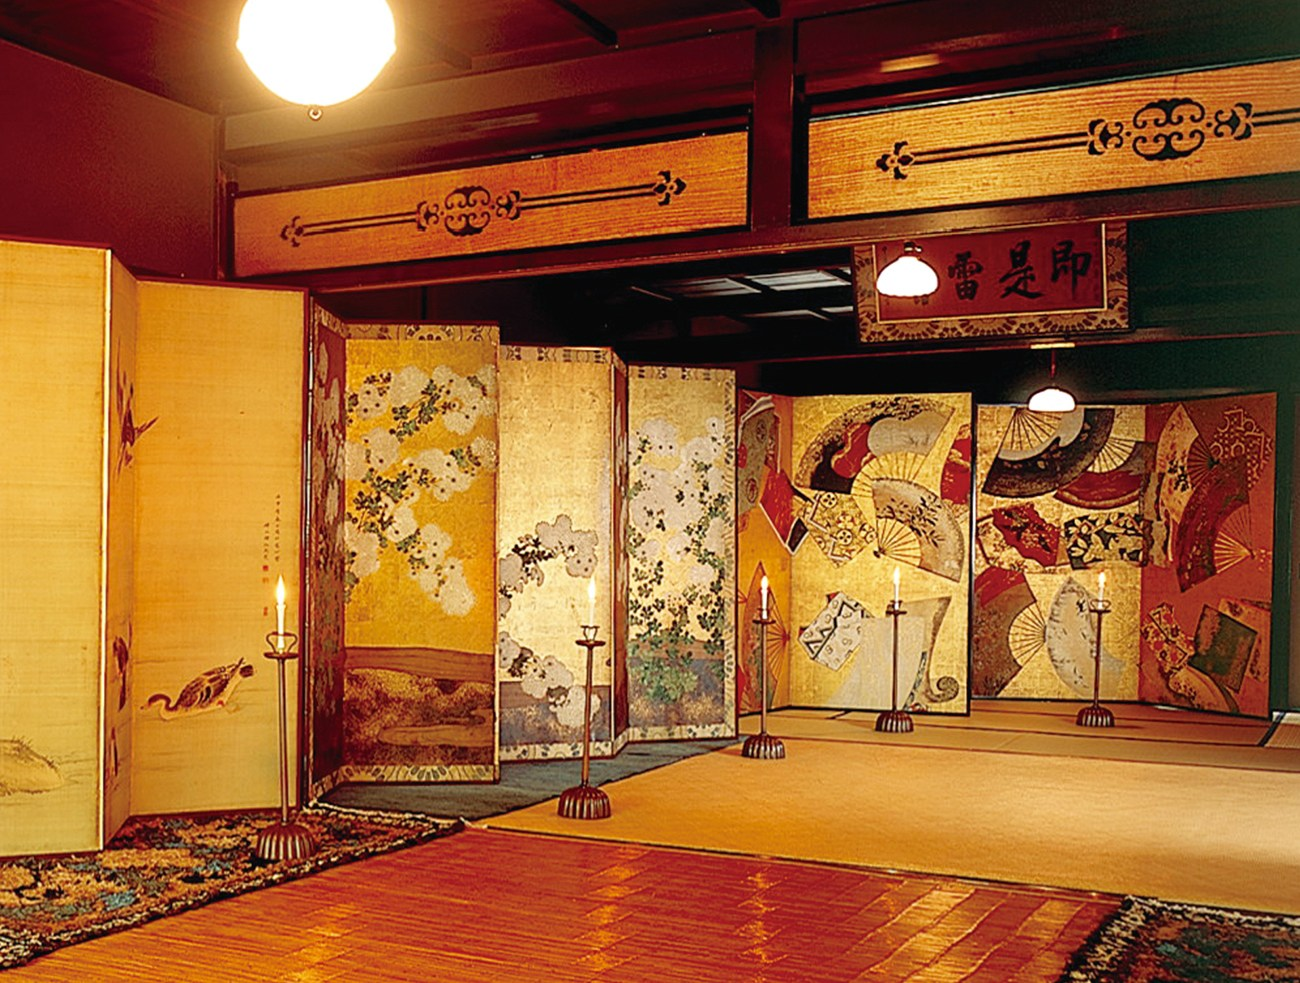 Byobu interior